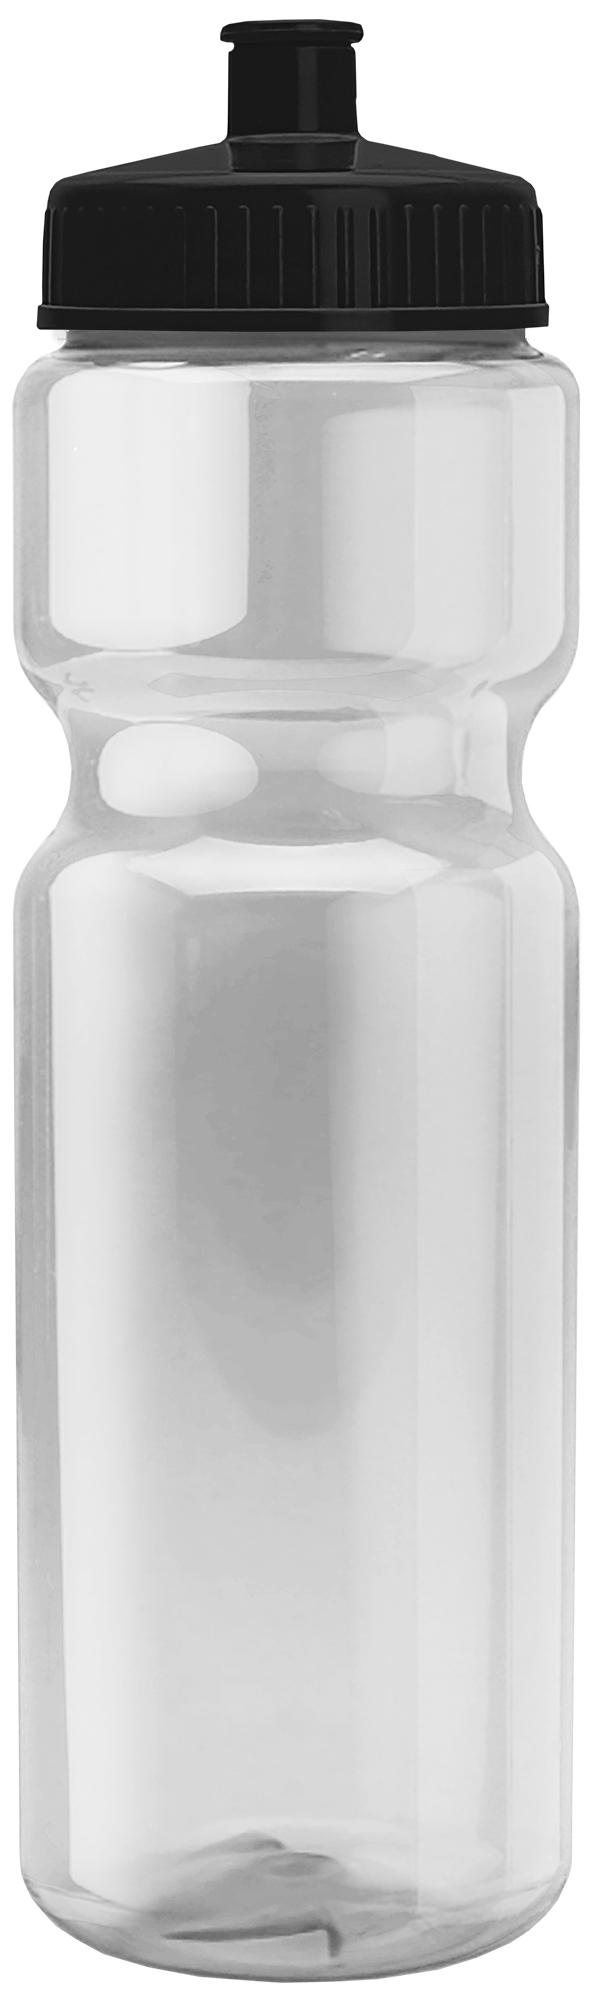 Transparent Sports Bottle, 28oz. - Push/Pull Lid